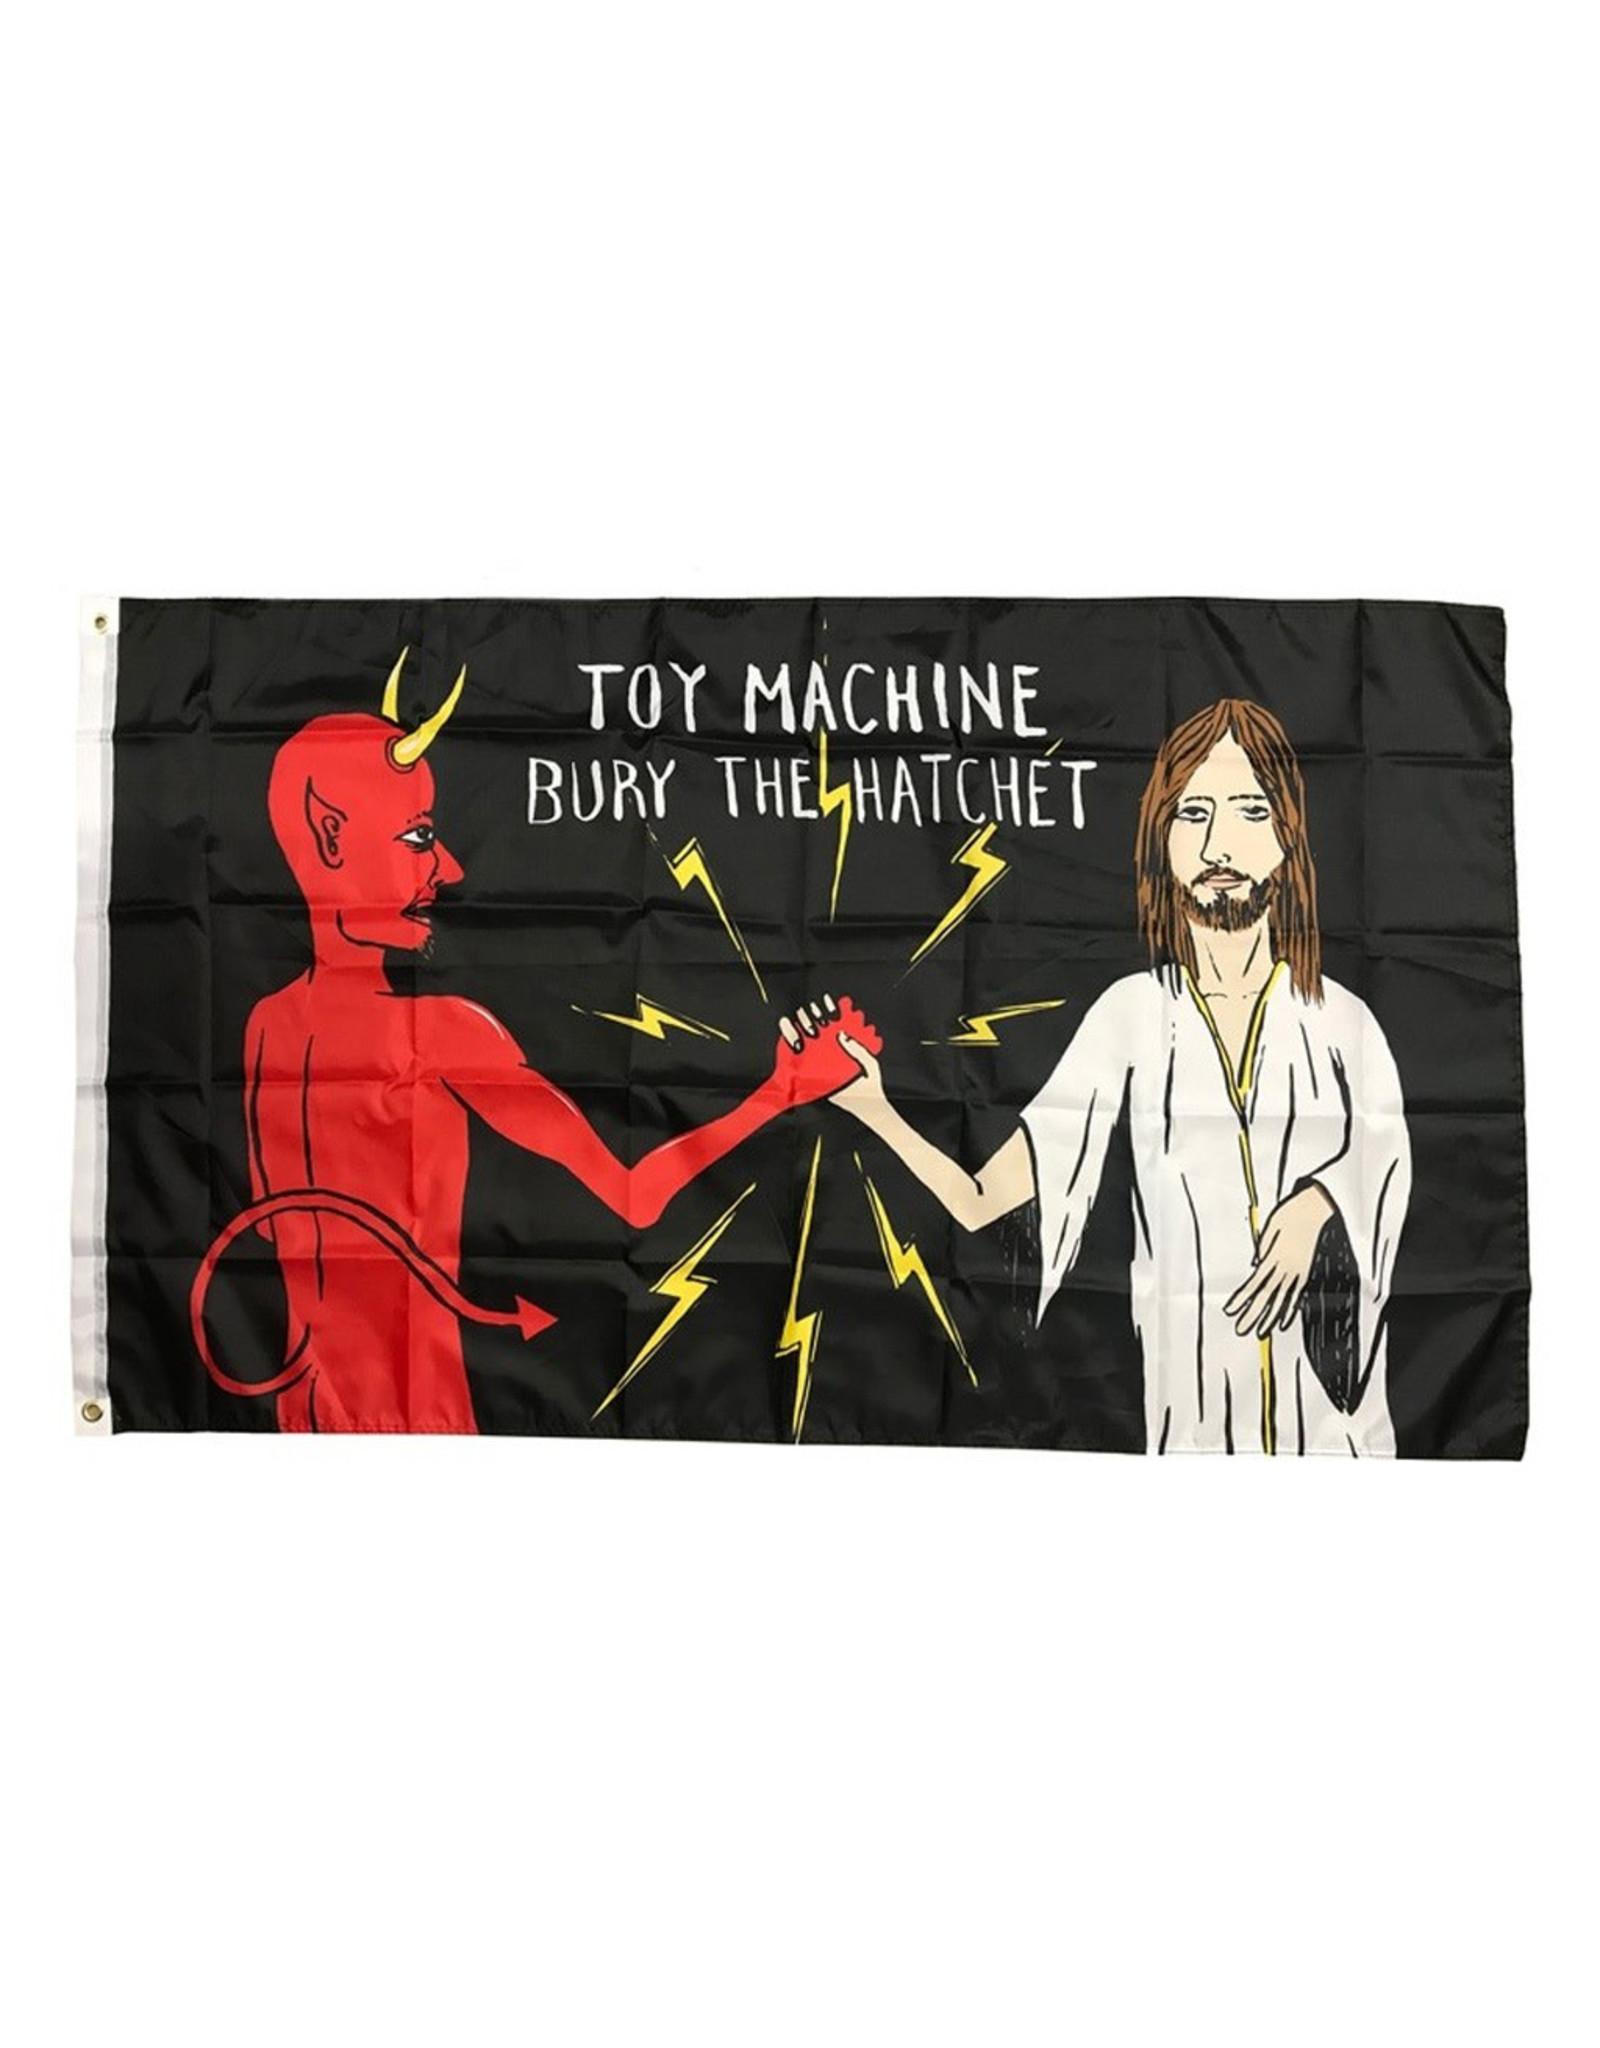 Toy Machine Toy Machine Flag Bury The Hatchet